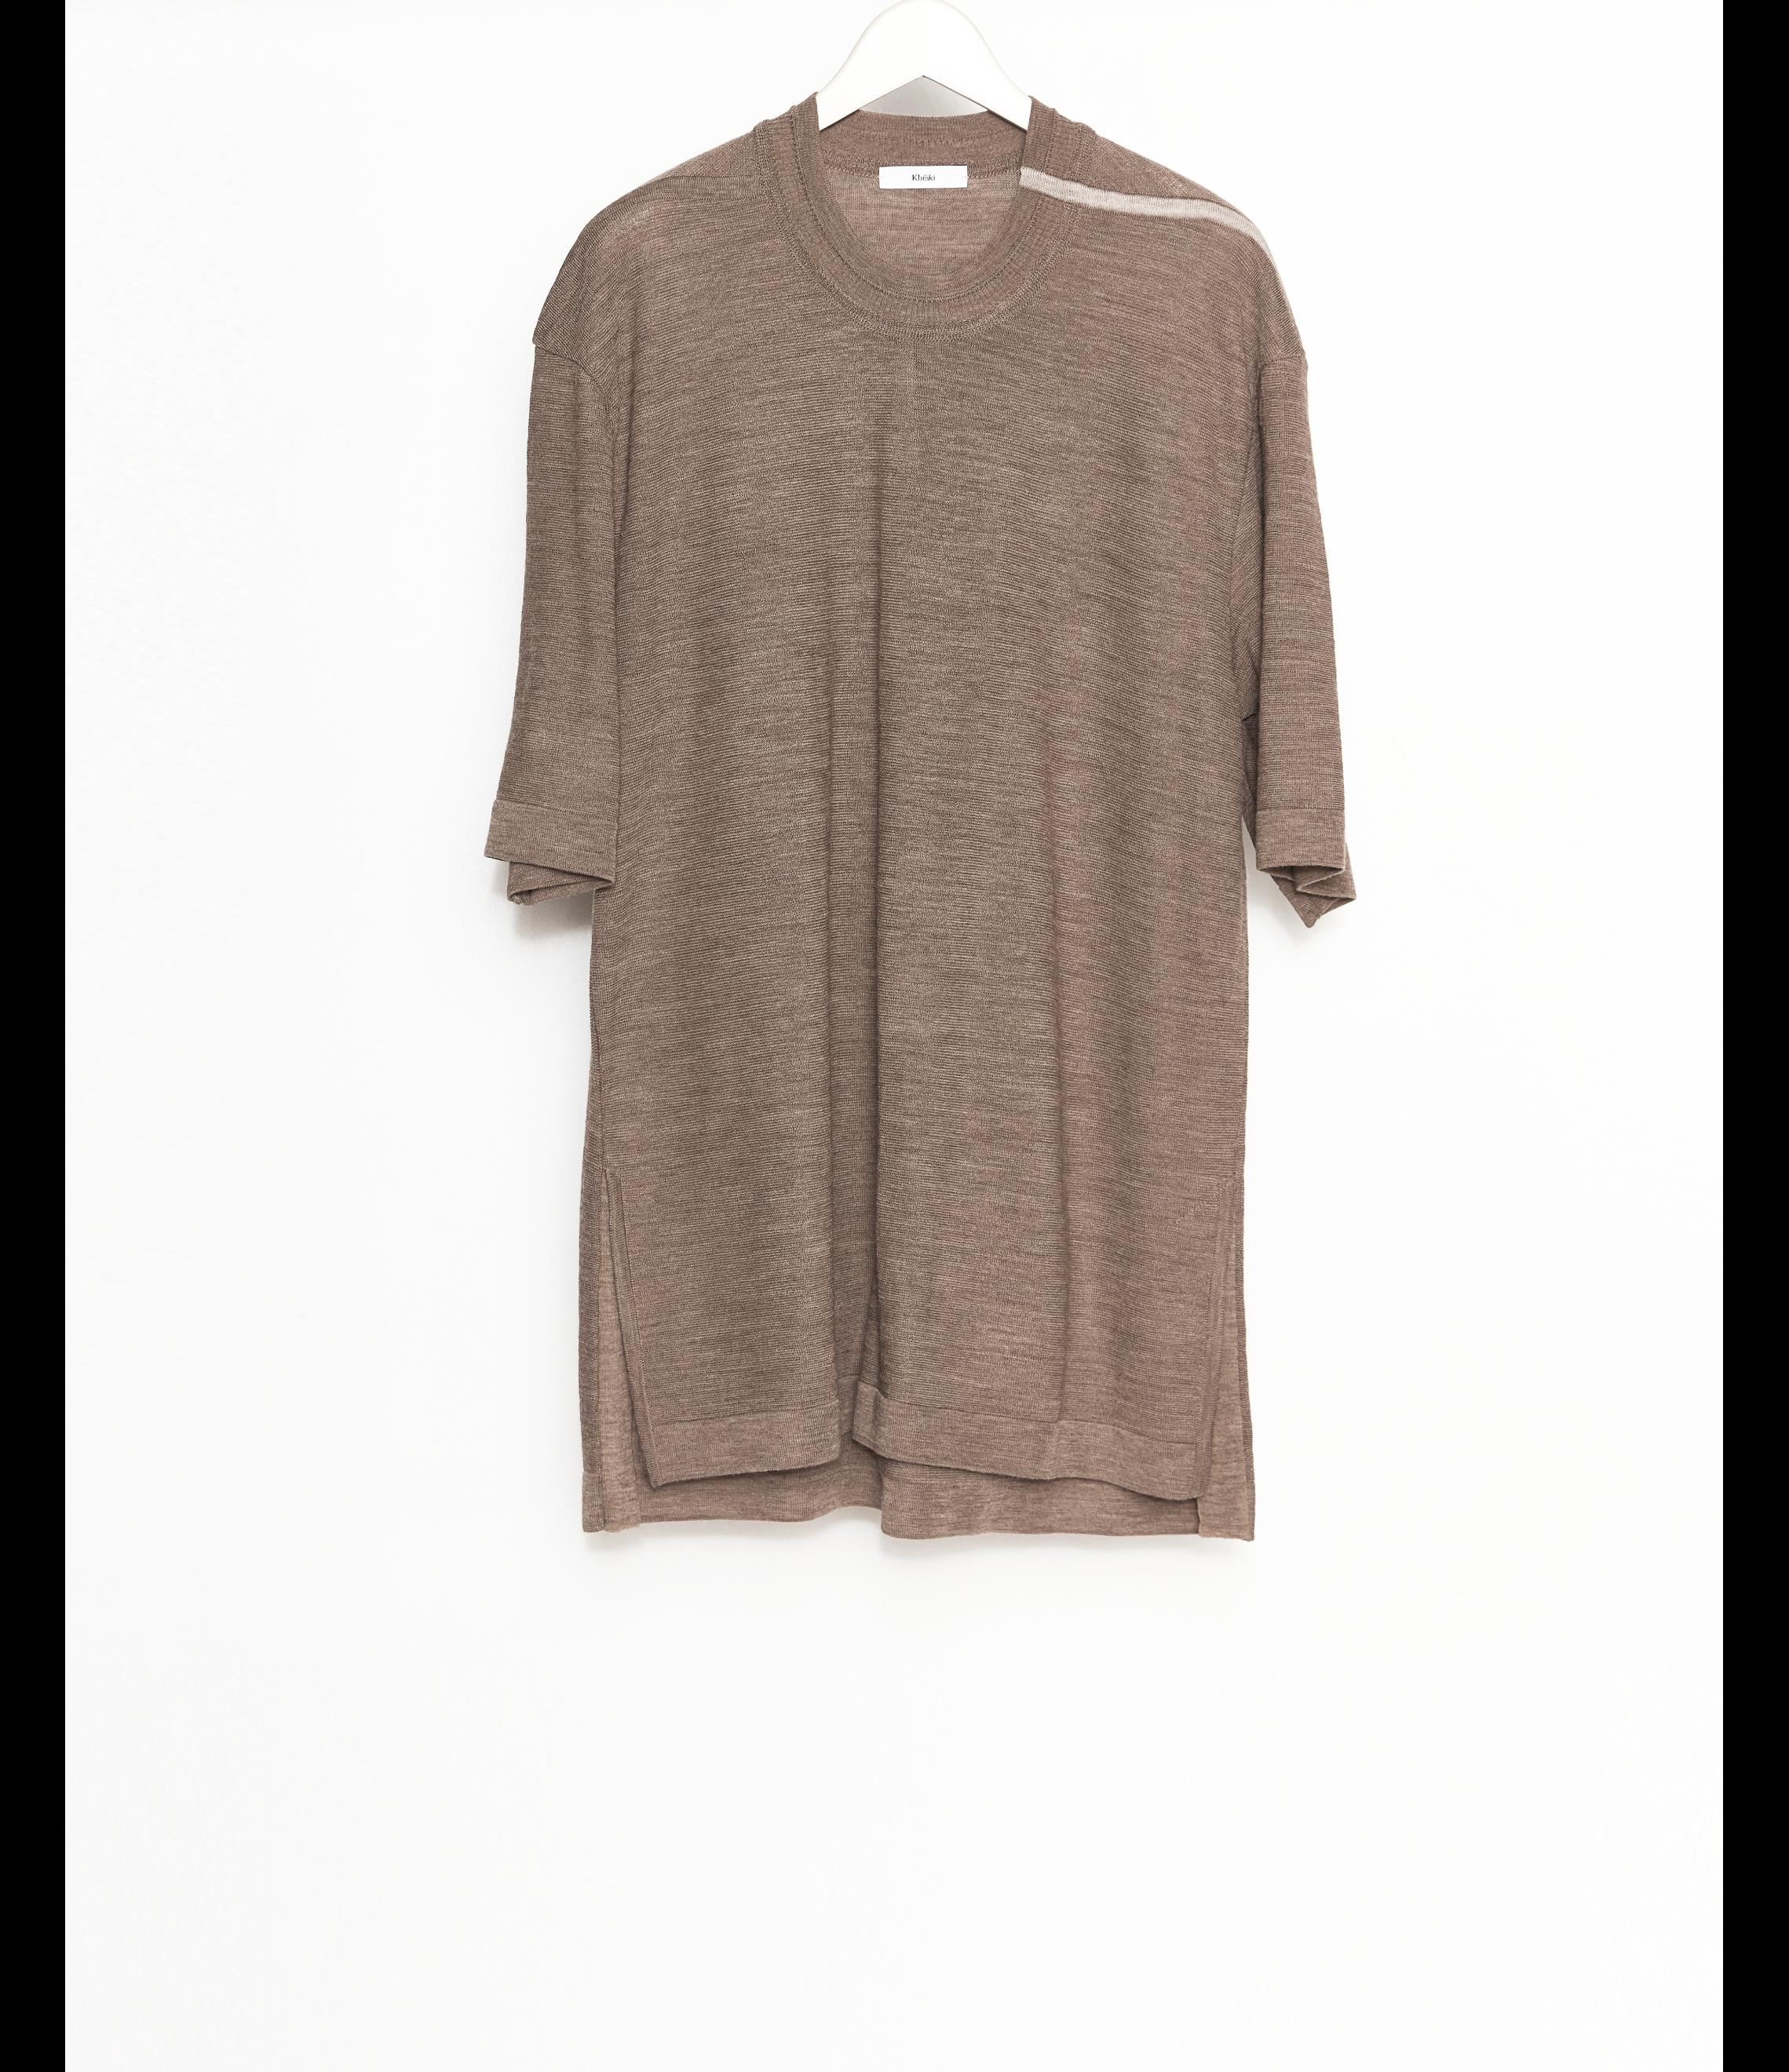 Knit T-Shirt / Brown